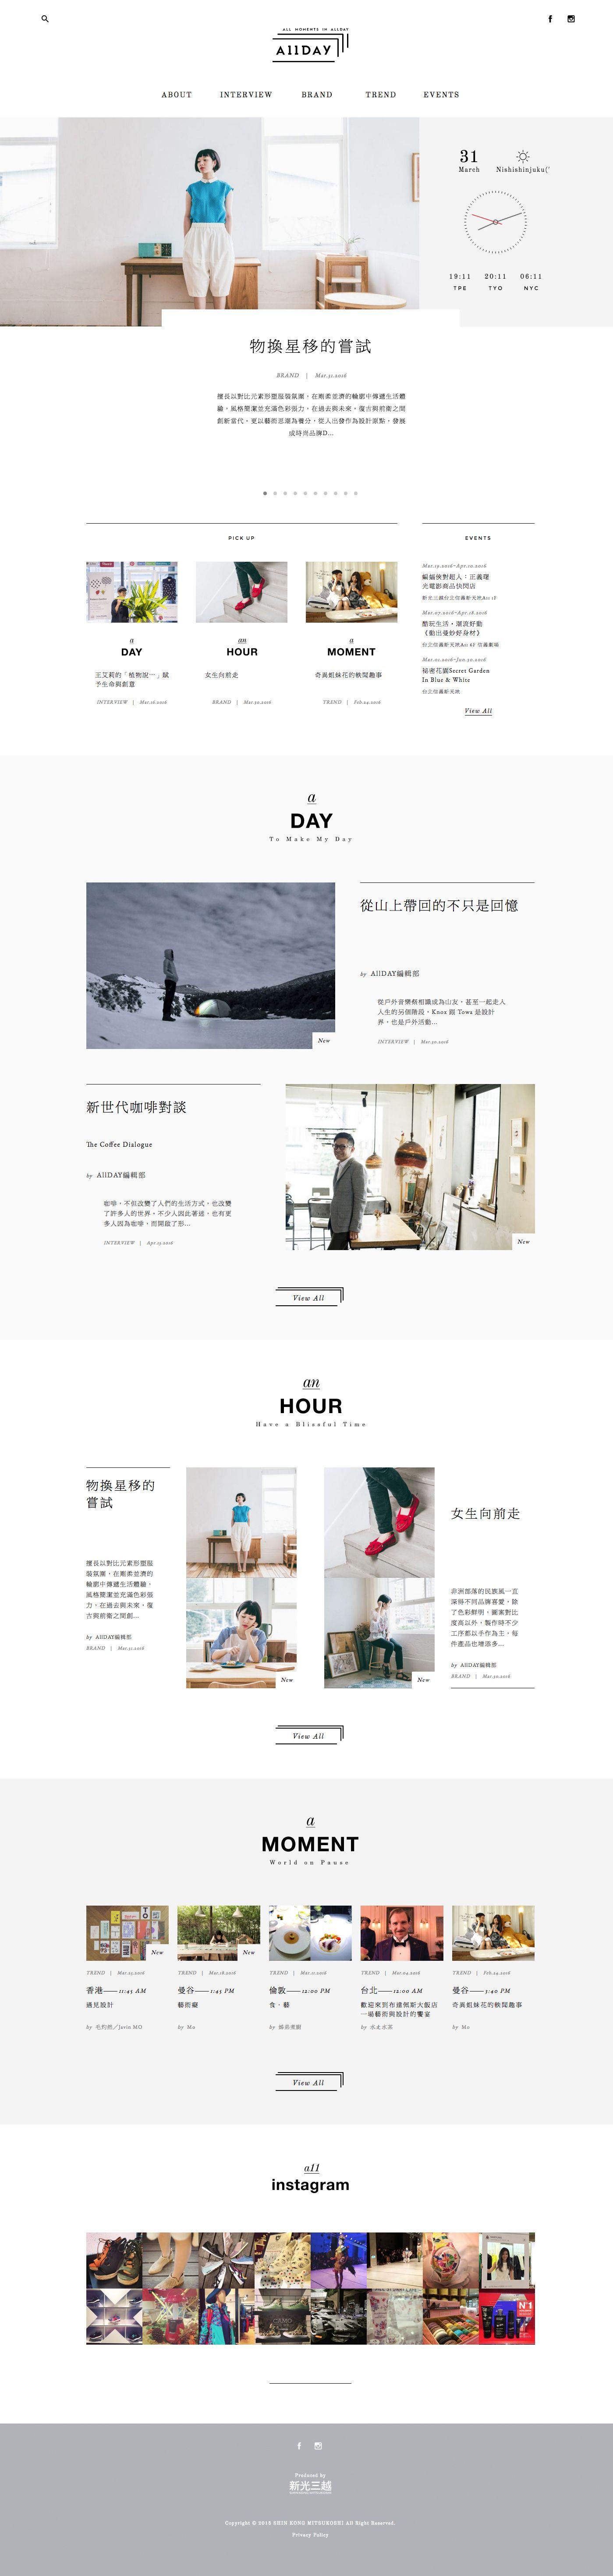 Allday   works - PRESENT #design #layout #webdesign #branding #uidesign #website #minimal #ウェブデザイン #ウェブサイトデザイン #ブランディング